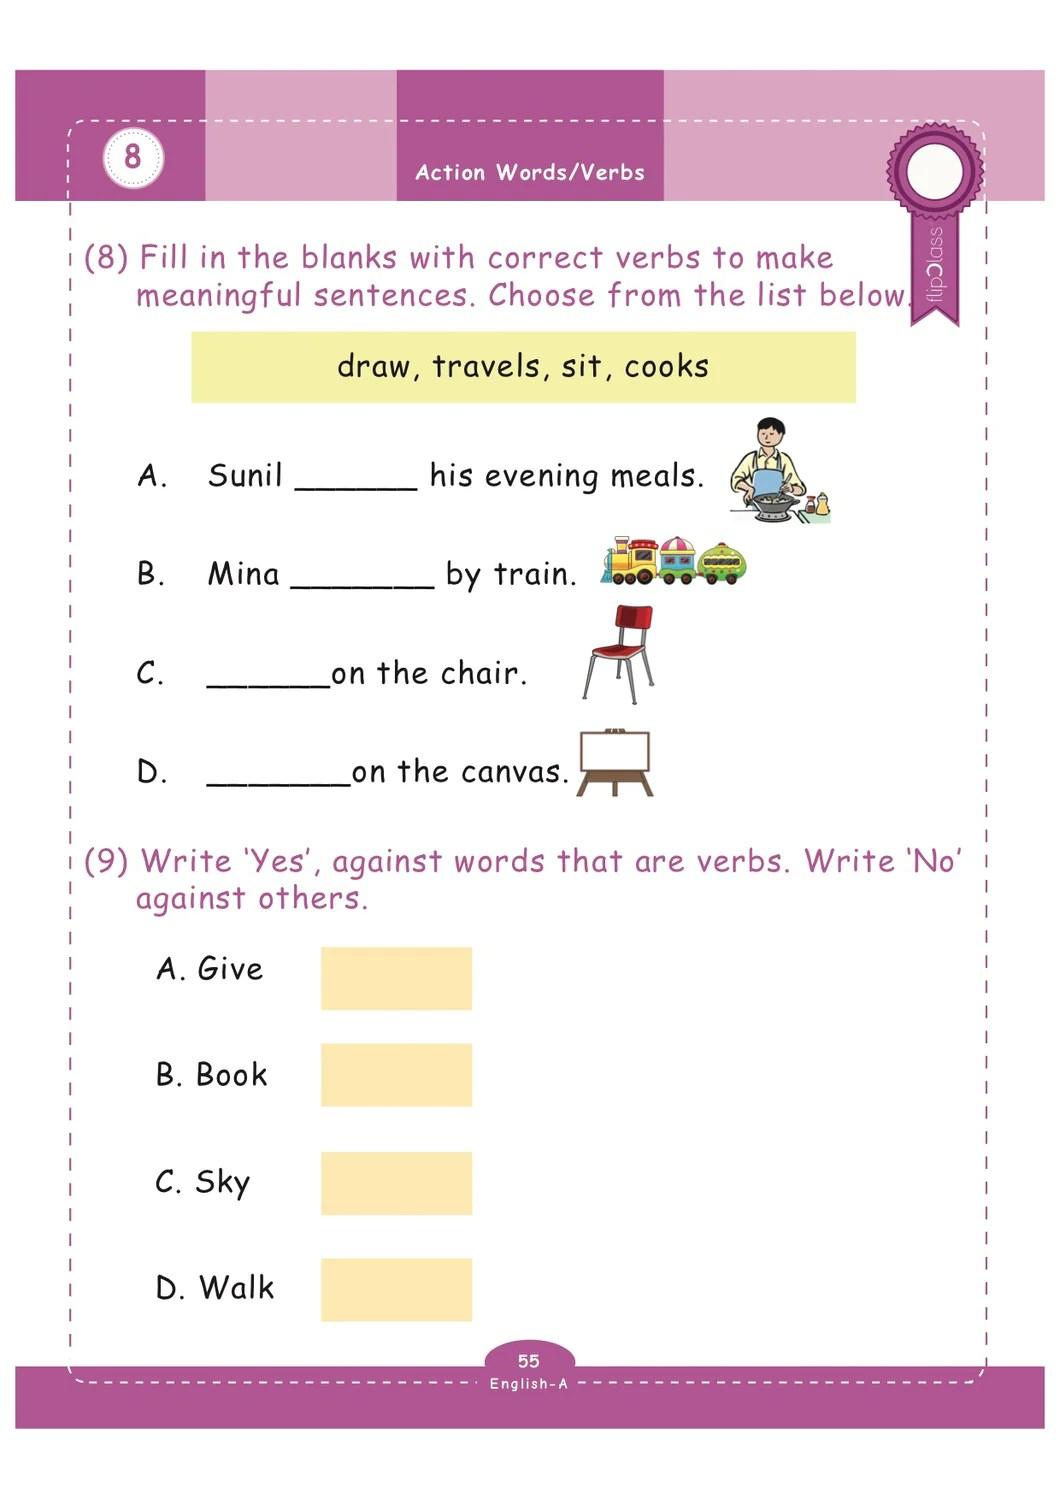 small resolution of https://dubaikhalifas.com/english-worksheet-for-class1-grade-1-english-worksheet-kids-learning-fun/